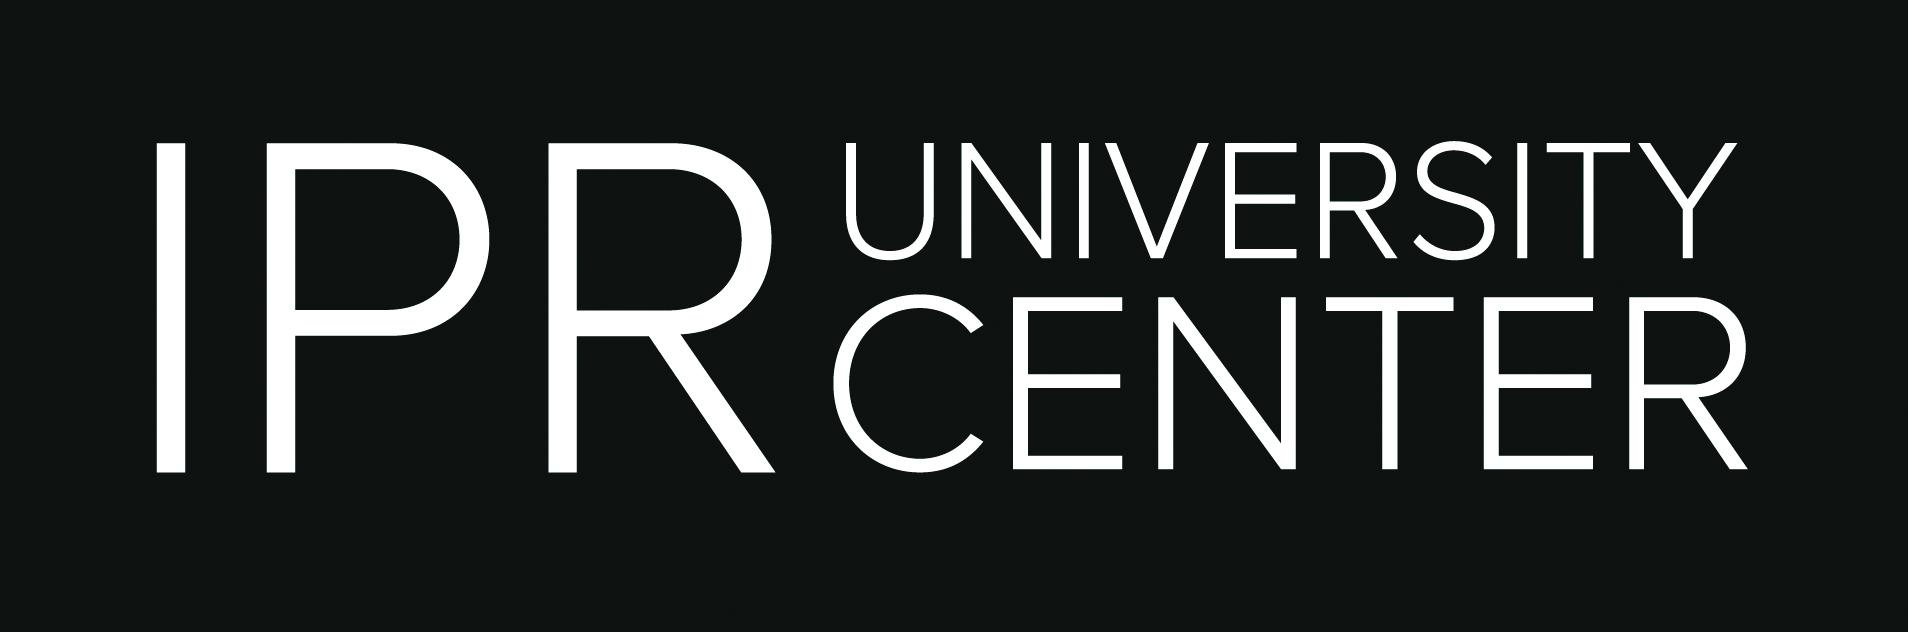 ipr-university-center-logo-cmyk-1.jpg (1.12 MB)